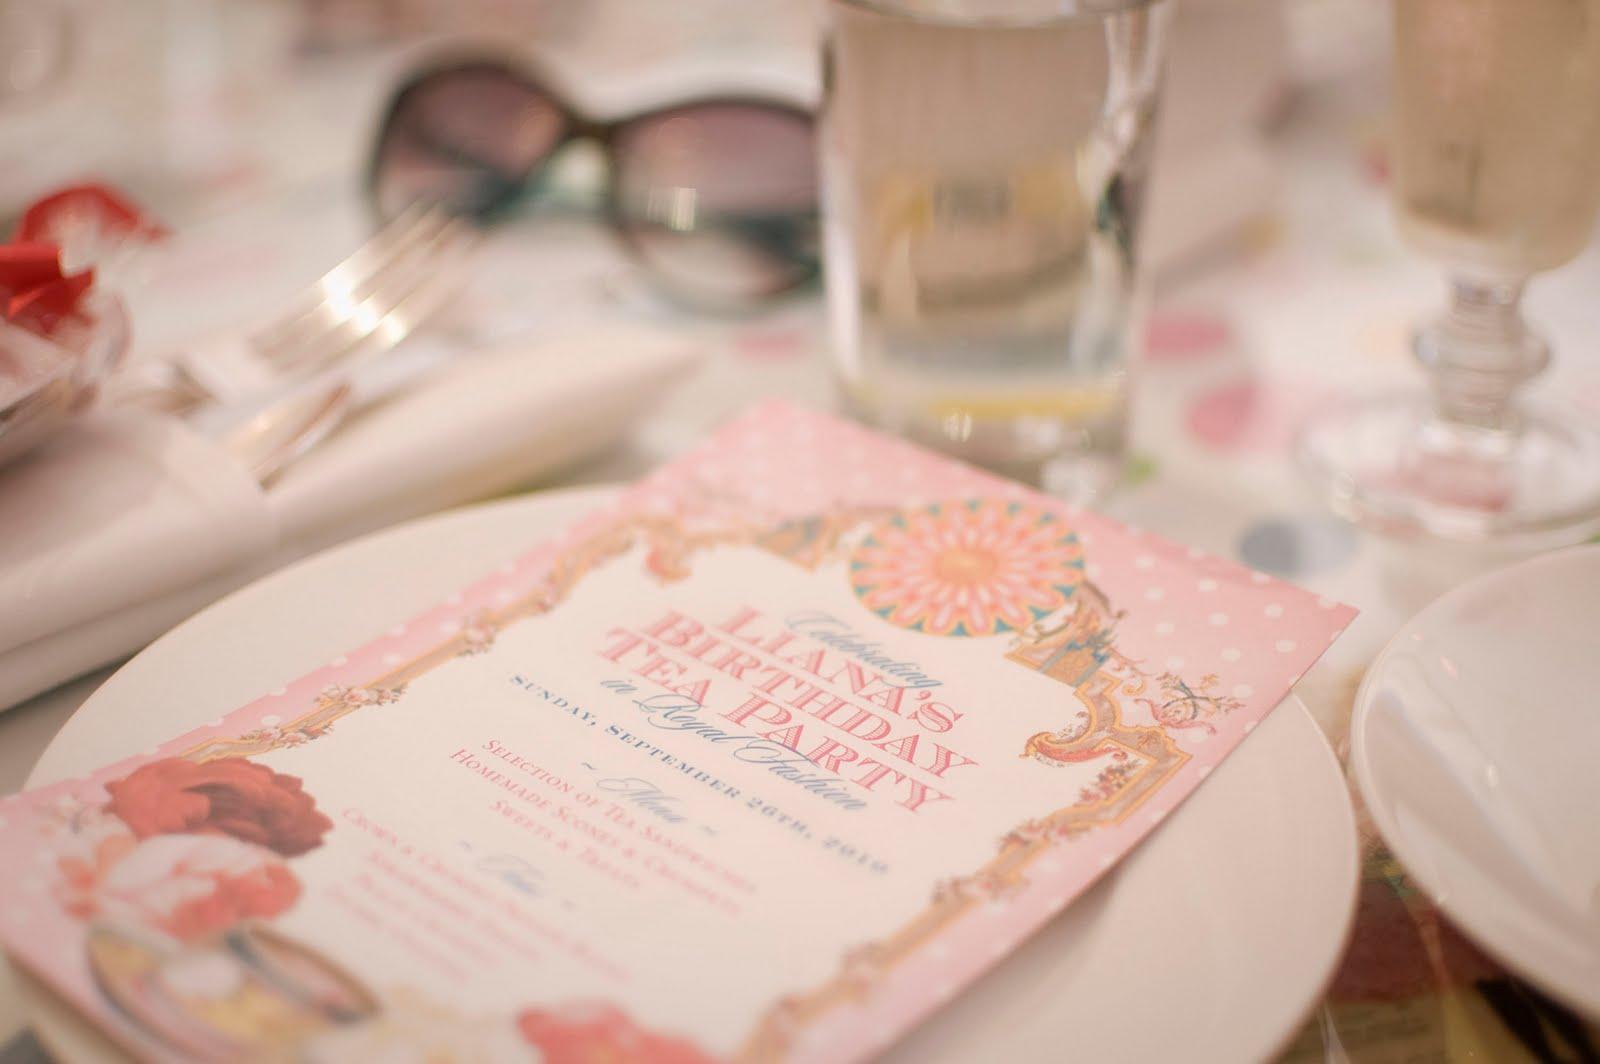 ♥ The Art of Liana Hee ♥: Birthday and tea time!